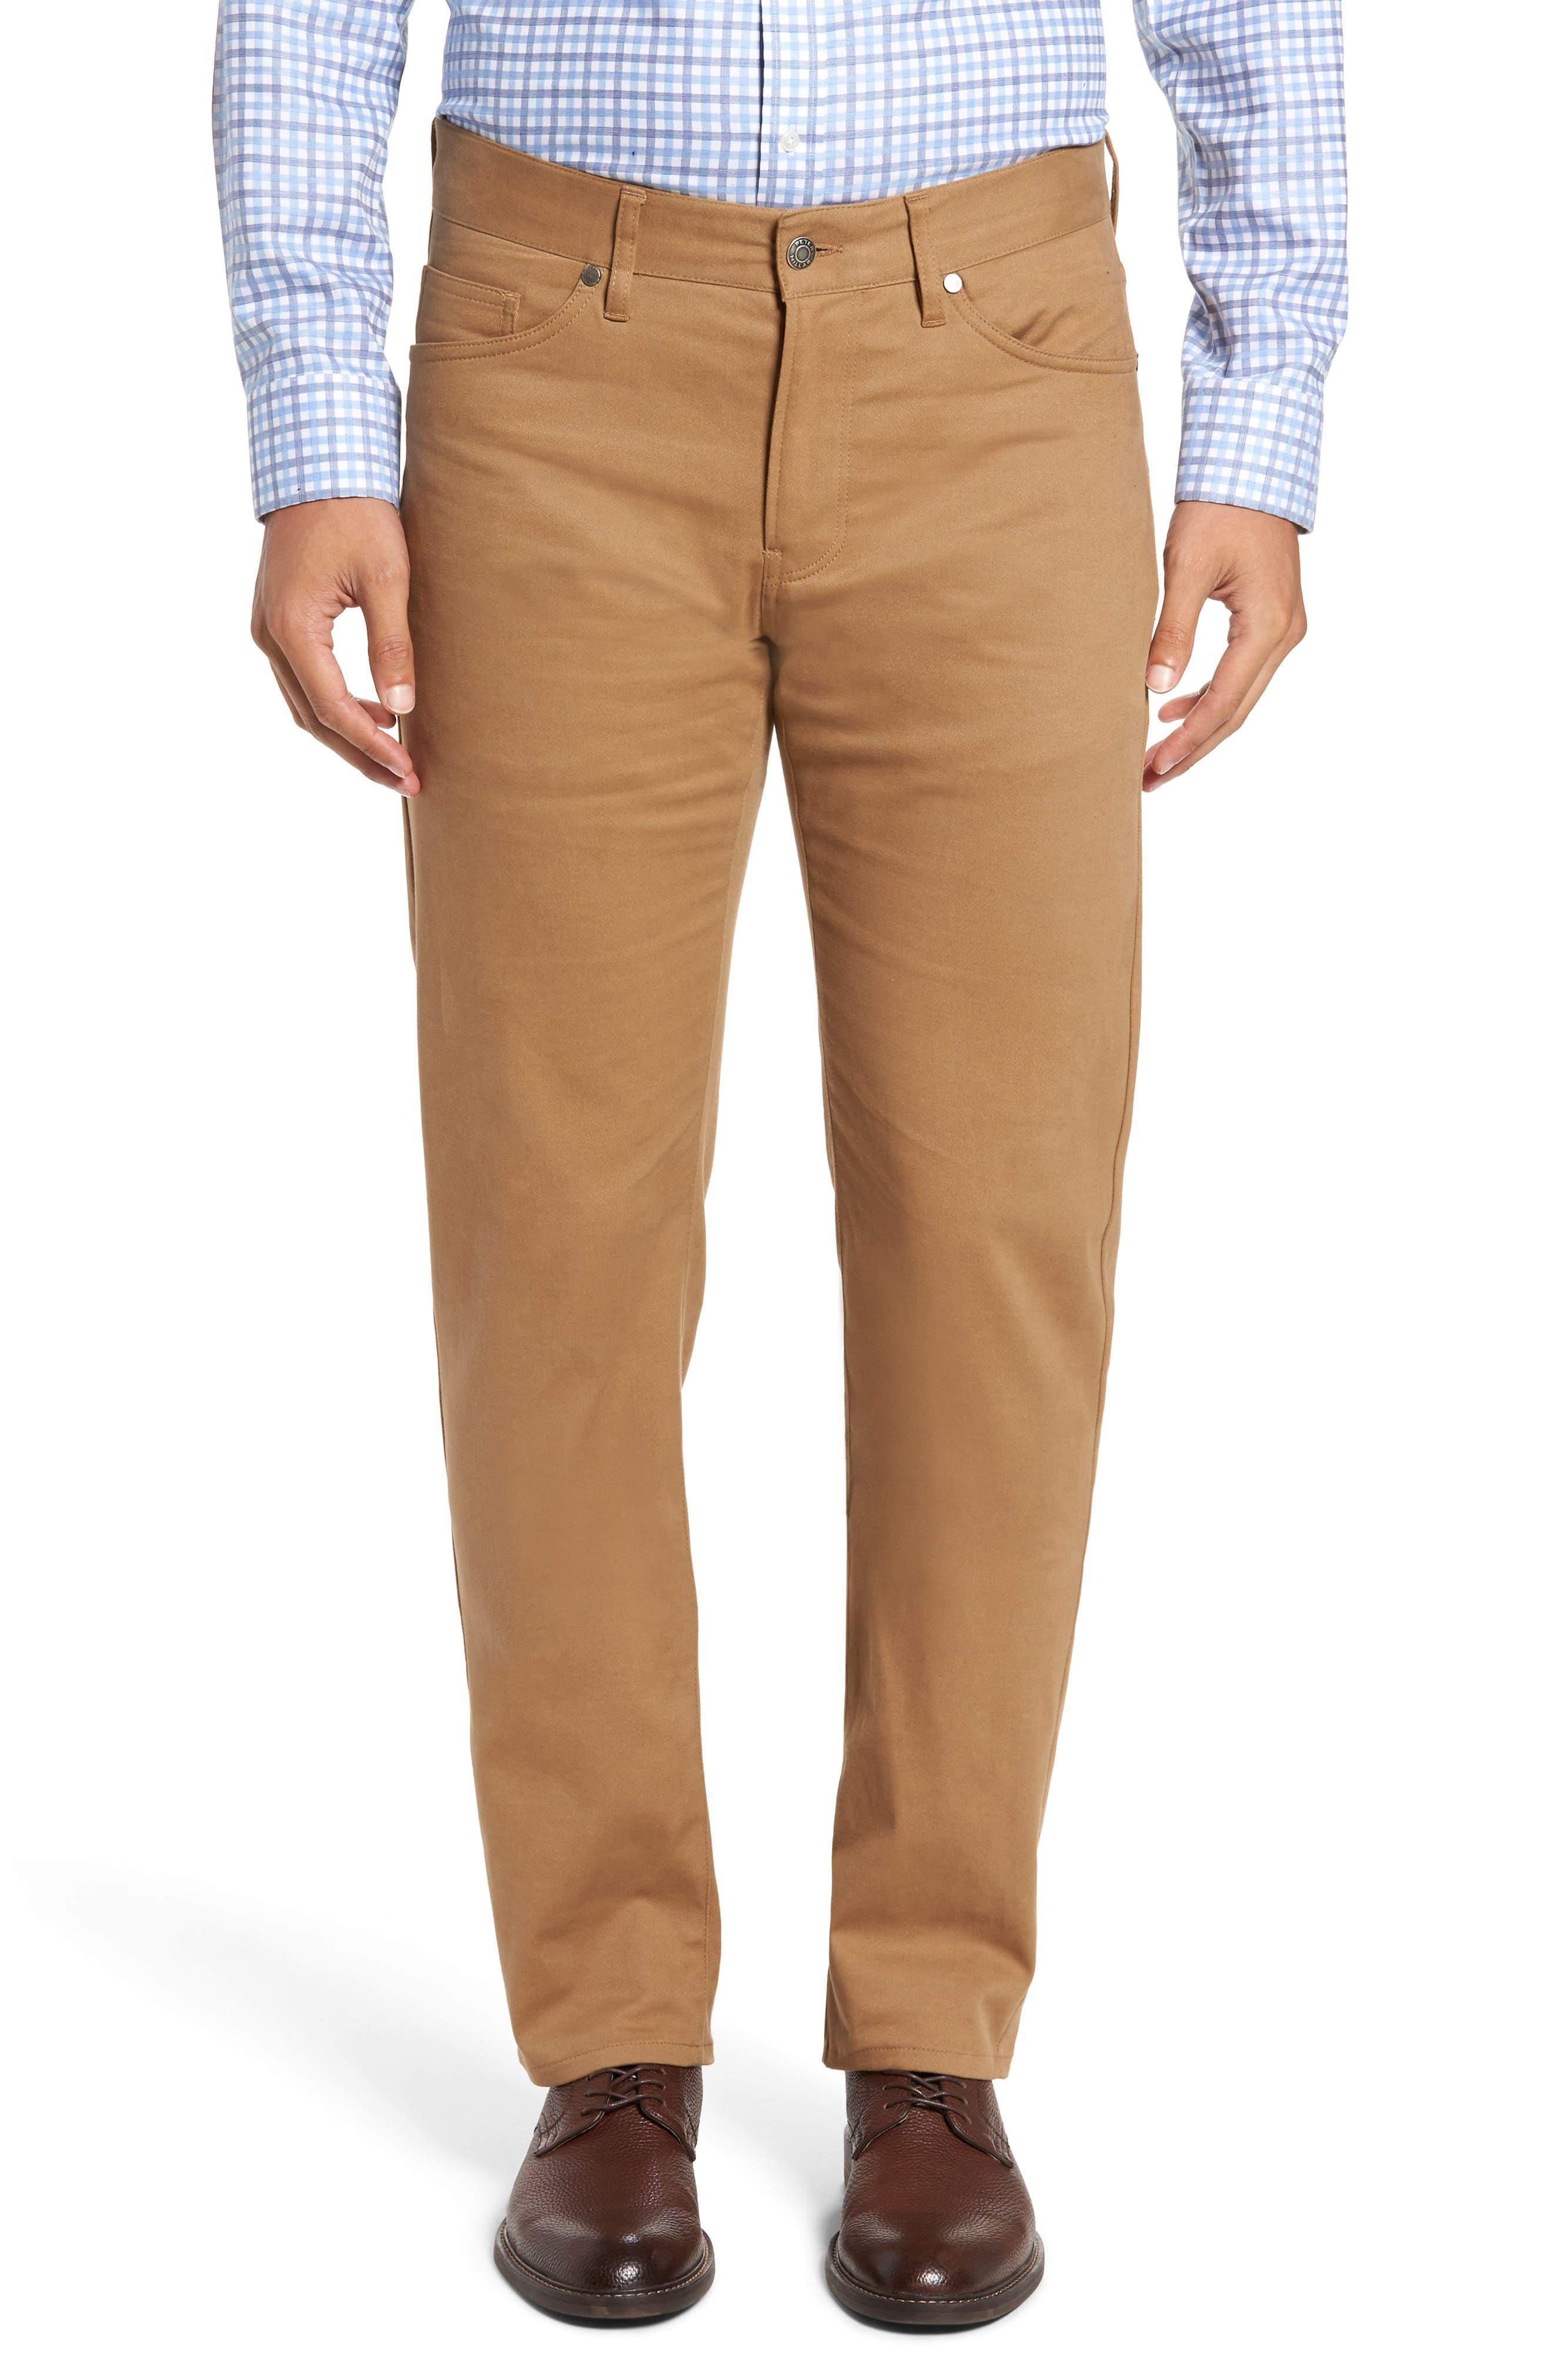 Peter Millar Perfect Twill 5-Pocket Pants (Regular & Big)